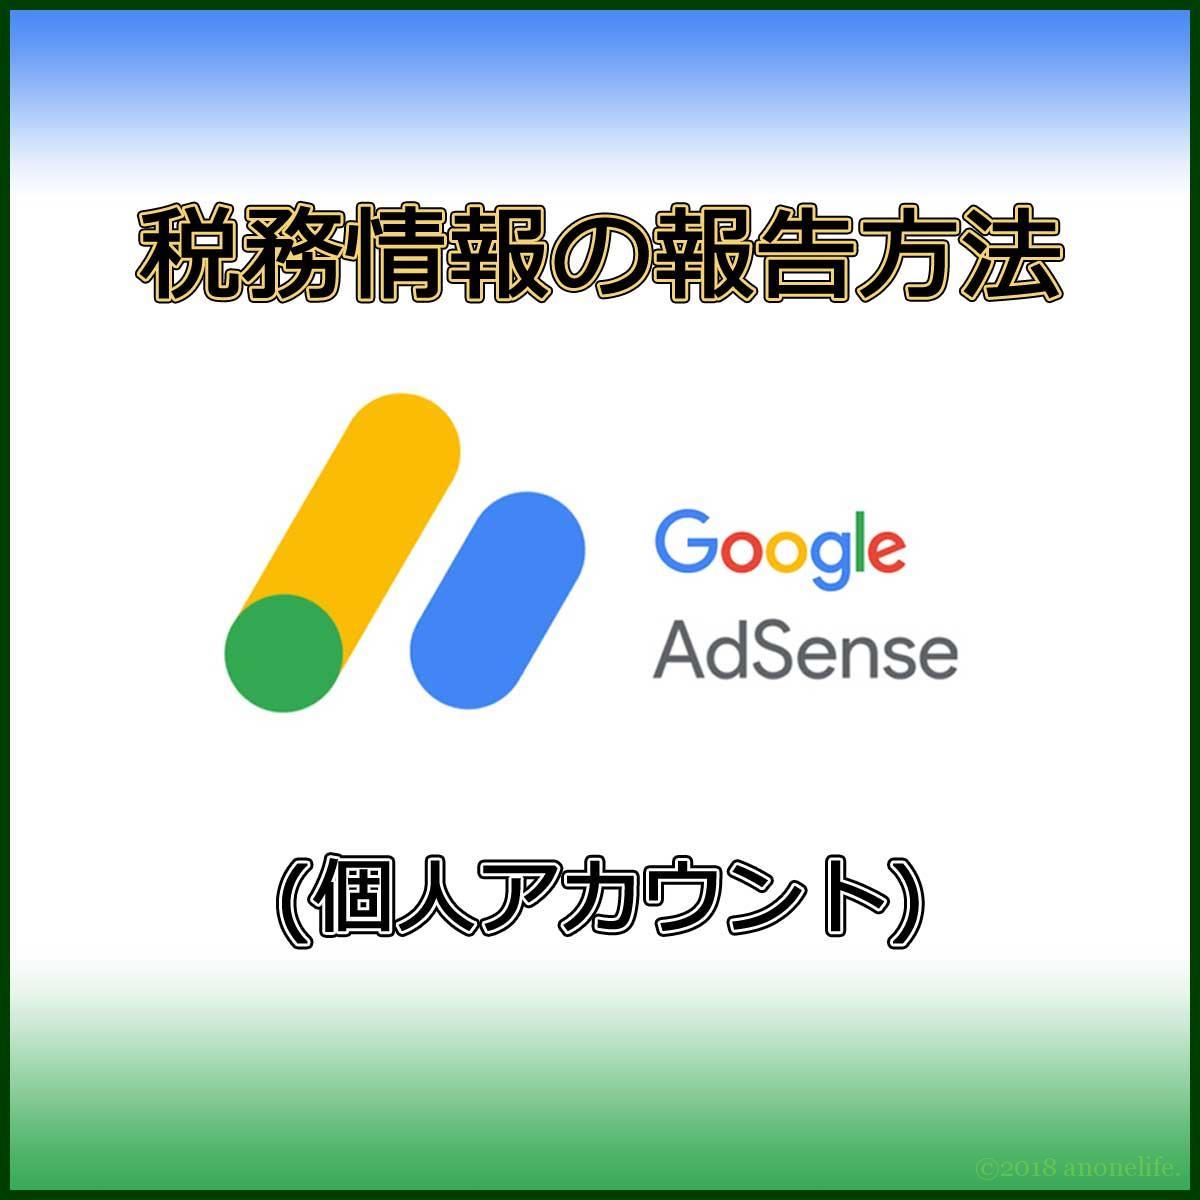 Google Adsence 米国の税務情報